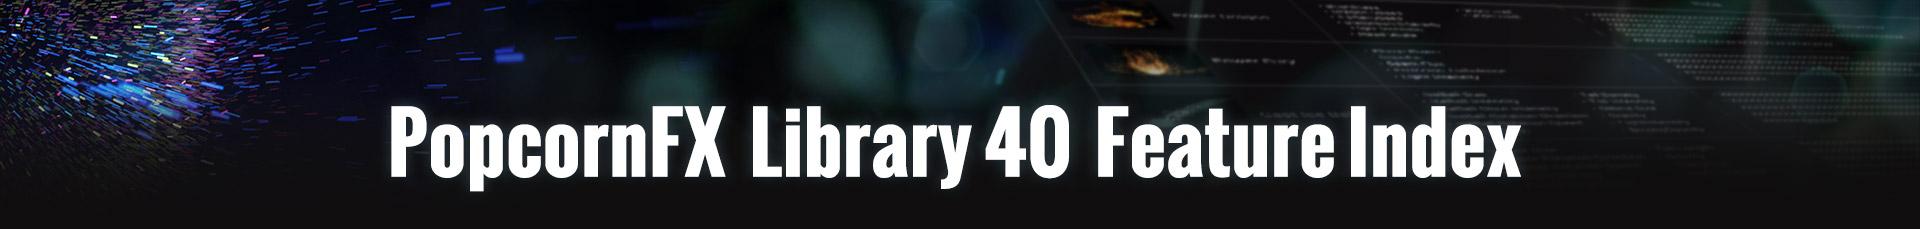 iClone7 - PopcornFX Library40